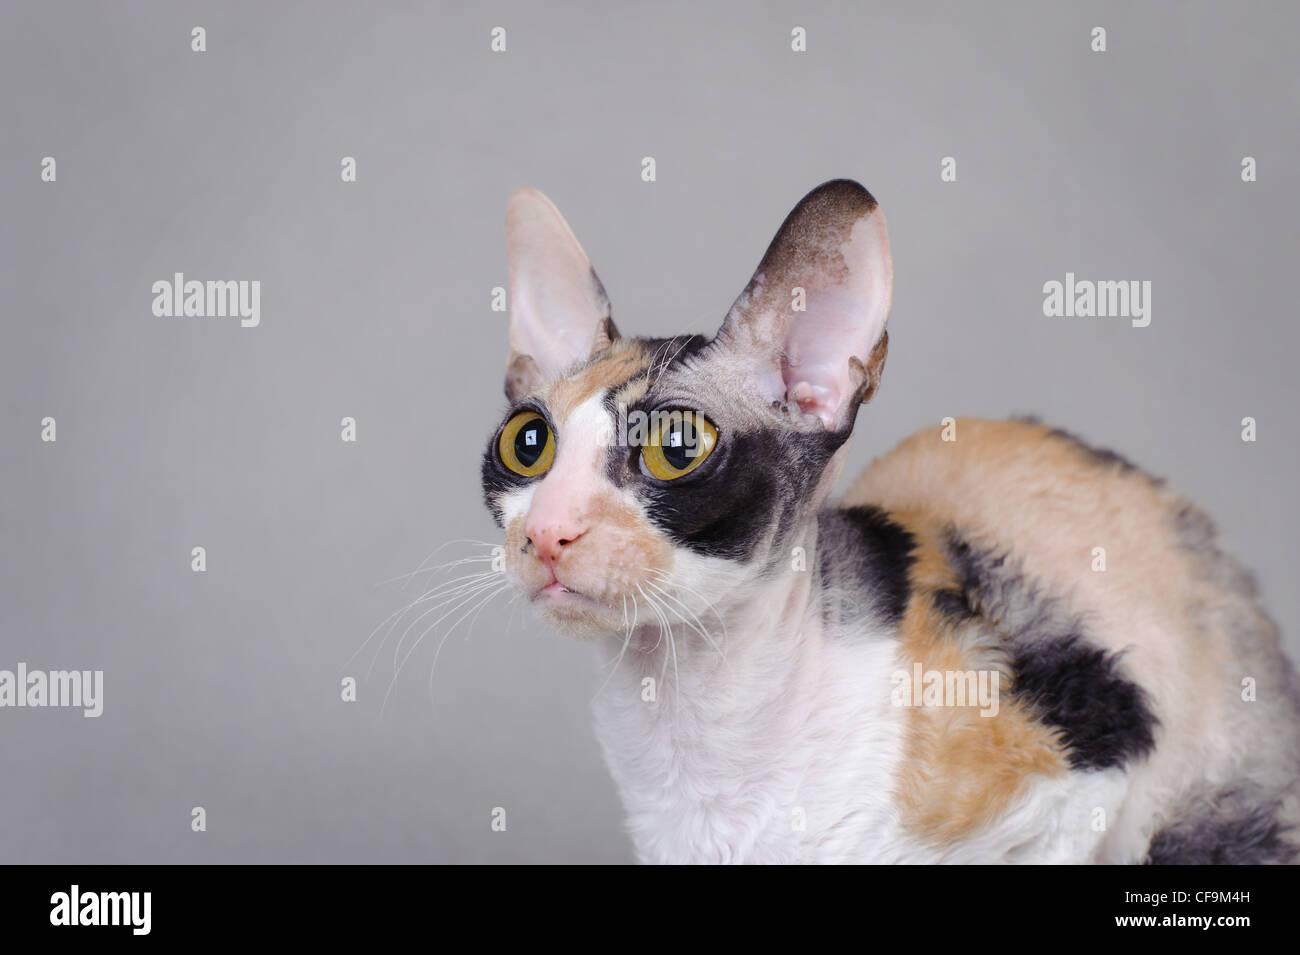 Cornish Rex cat - Stock Image